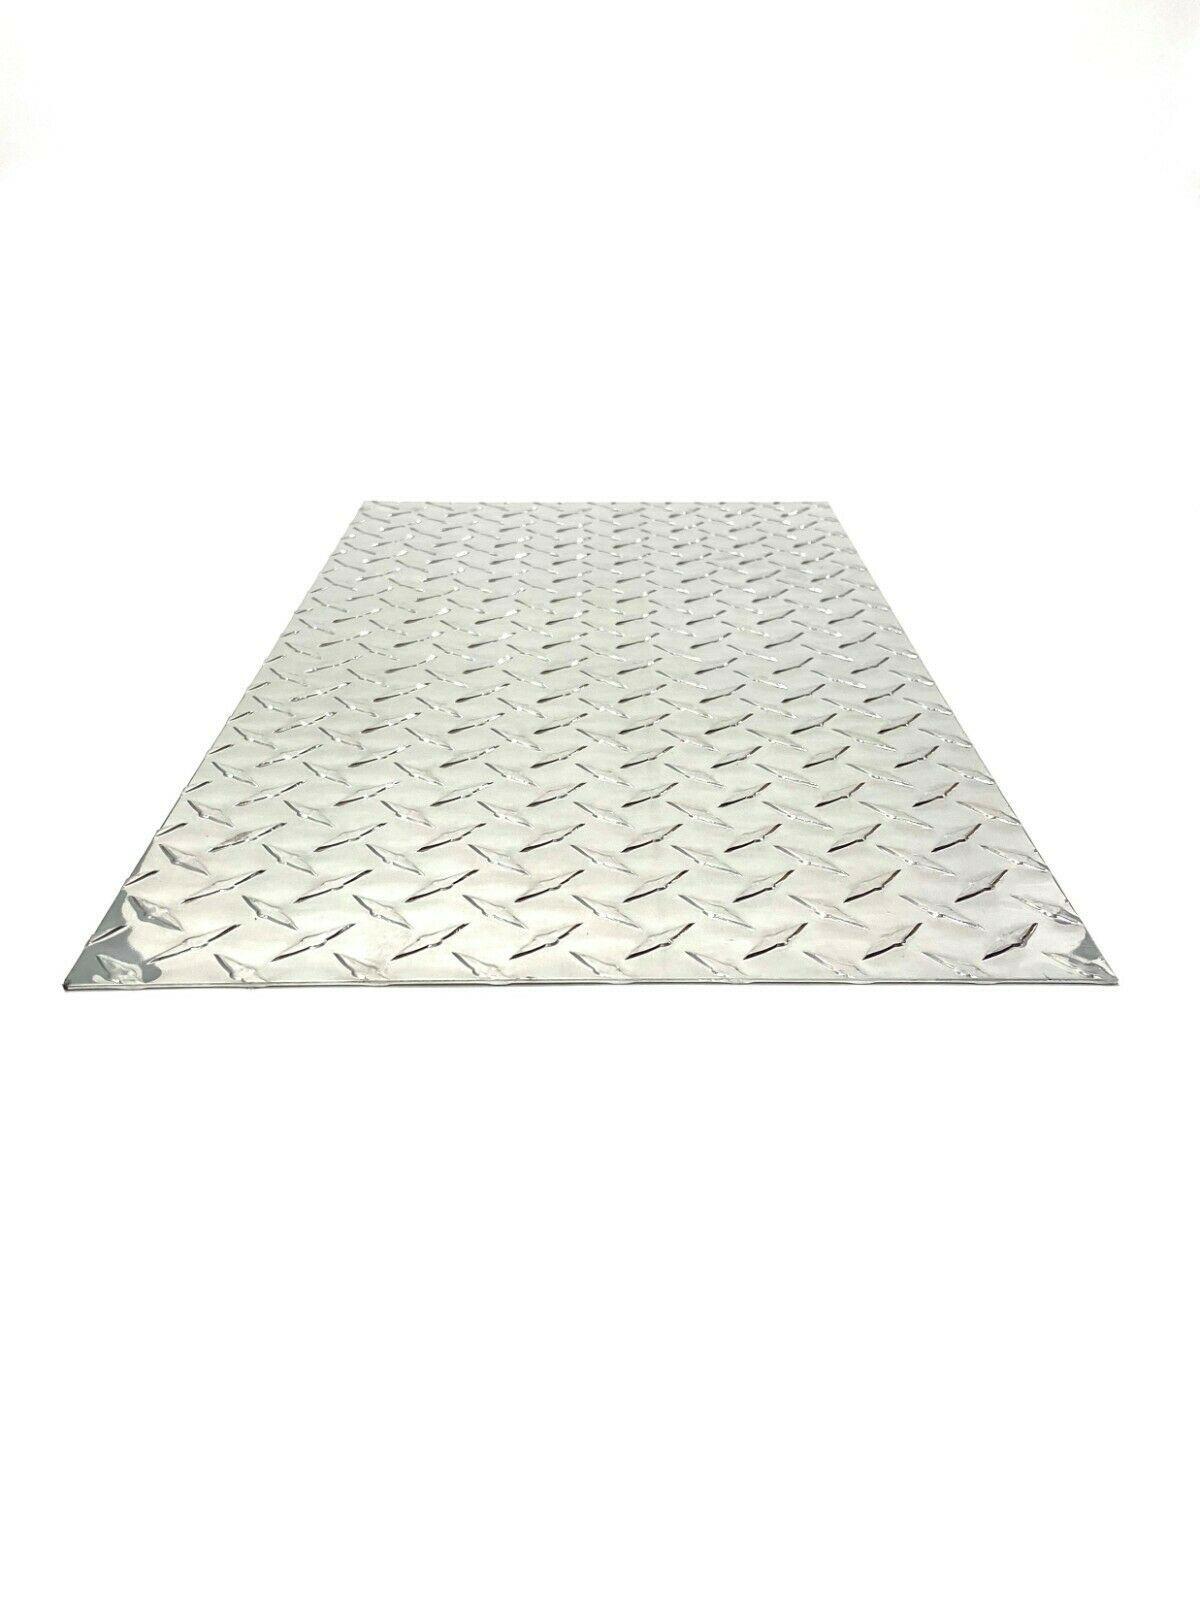 "DIAMOND PLATE TREAD BRITE .045 x 48/"" x 90/"" alloy 3003"